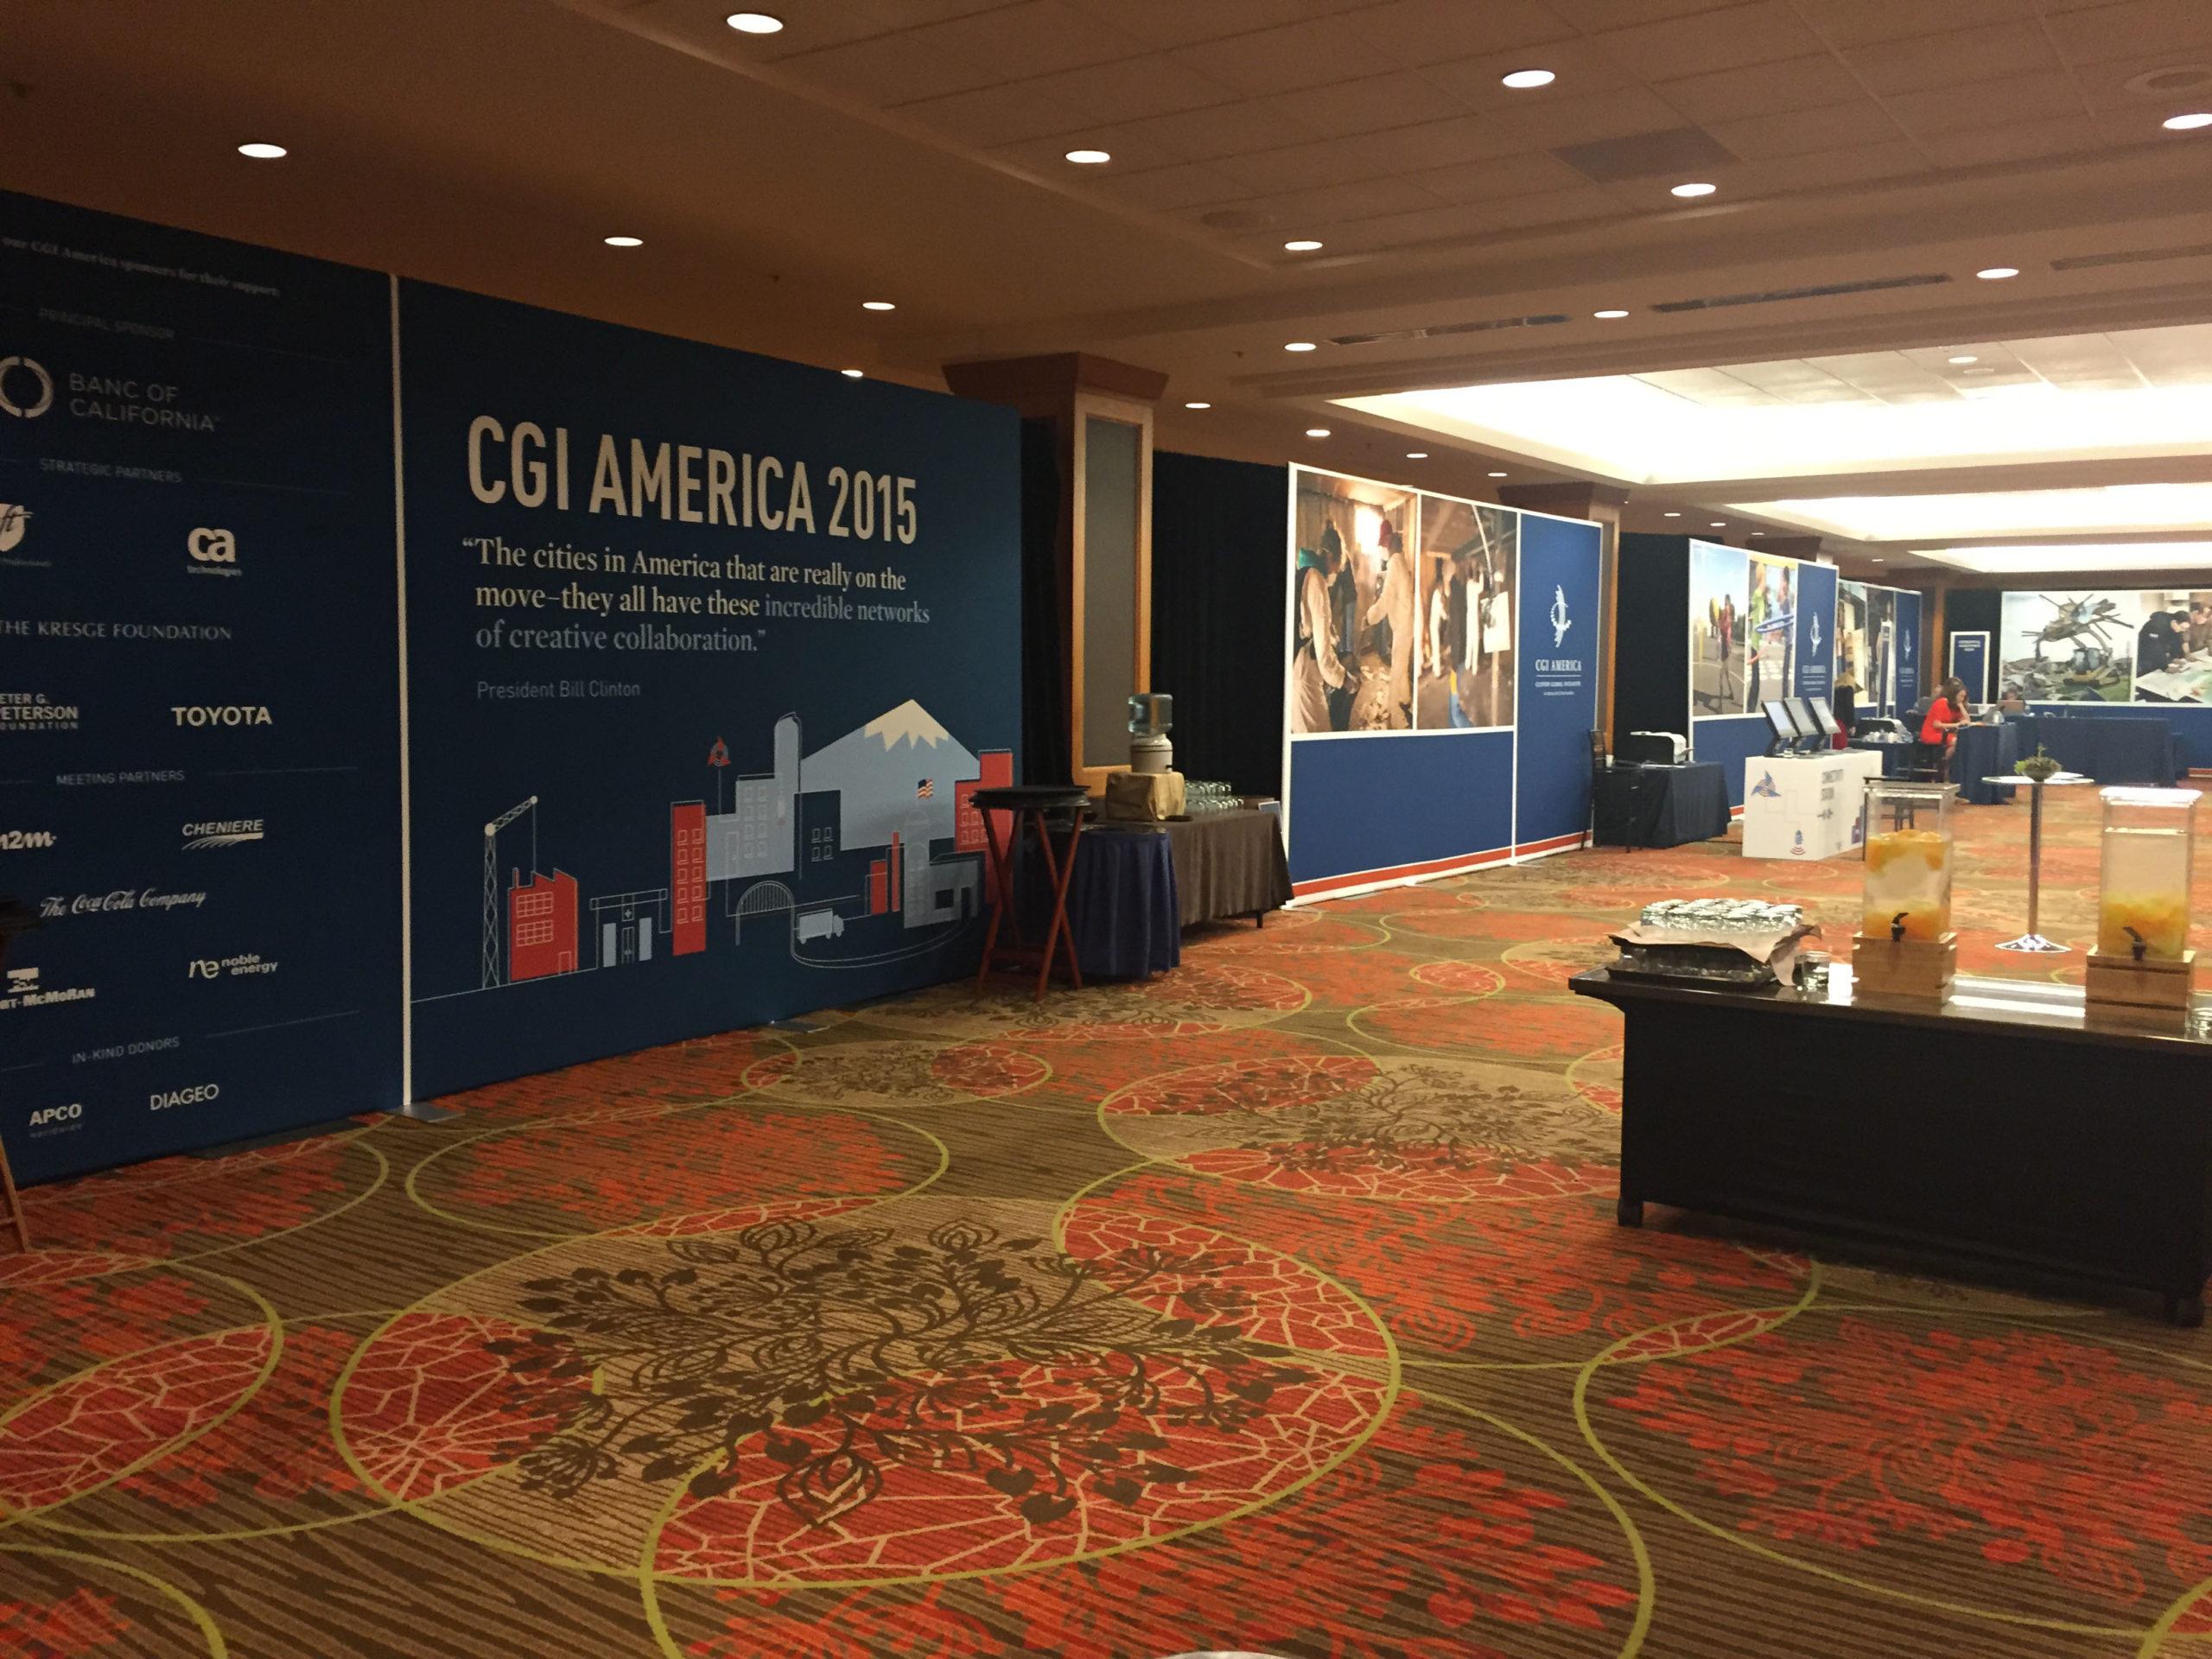 CGI America 2015